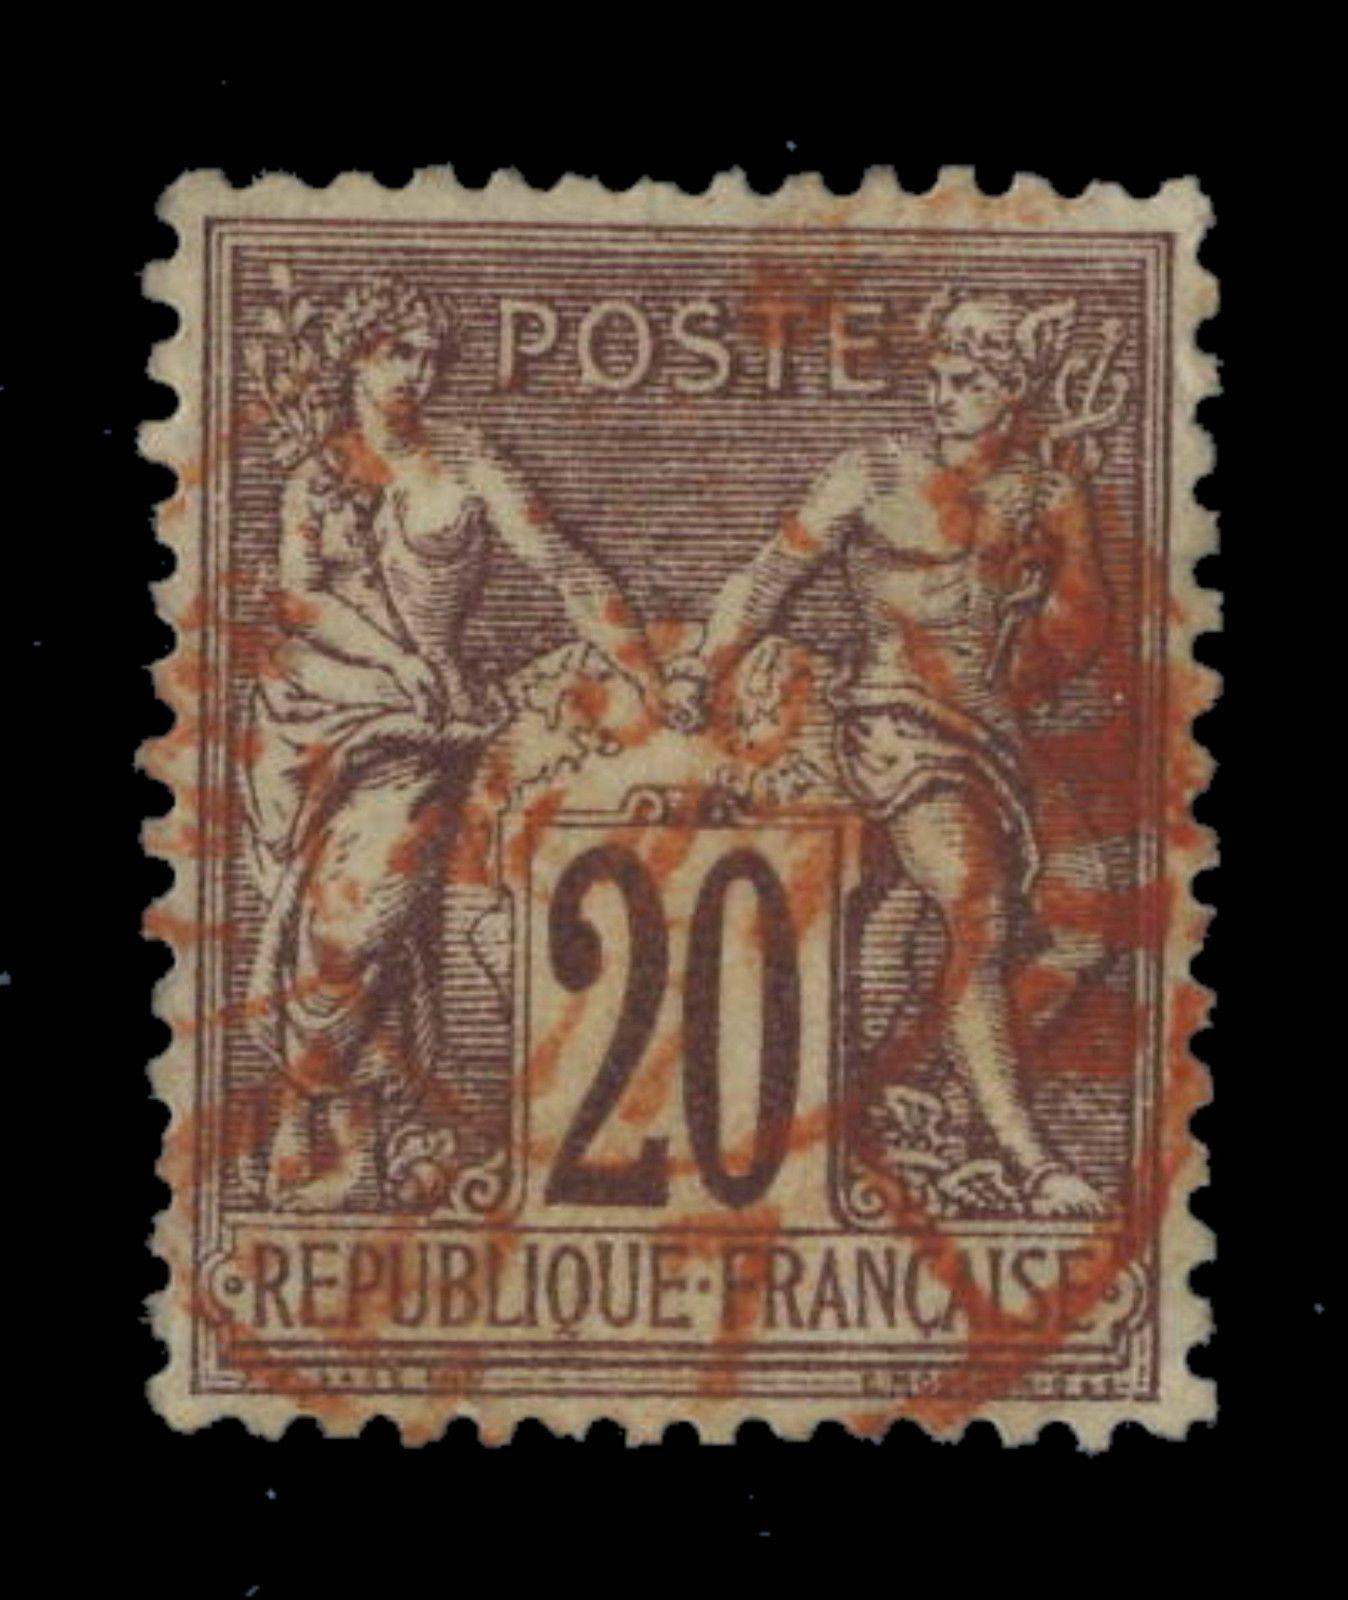 TYPE SAGE - 1876 - N°67 20c BRUN-LILAS (N sous B) CAD ROUGE DES IMPRIMÉS SUPERBE in Timbres, France, France: oblitérés | eBay